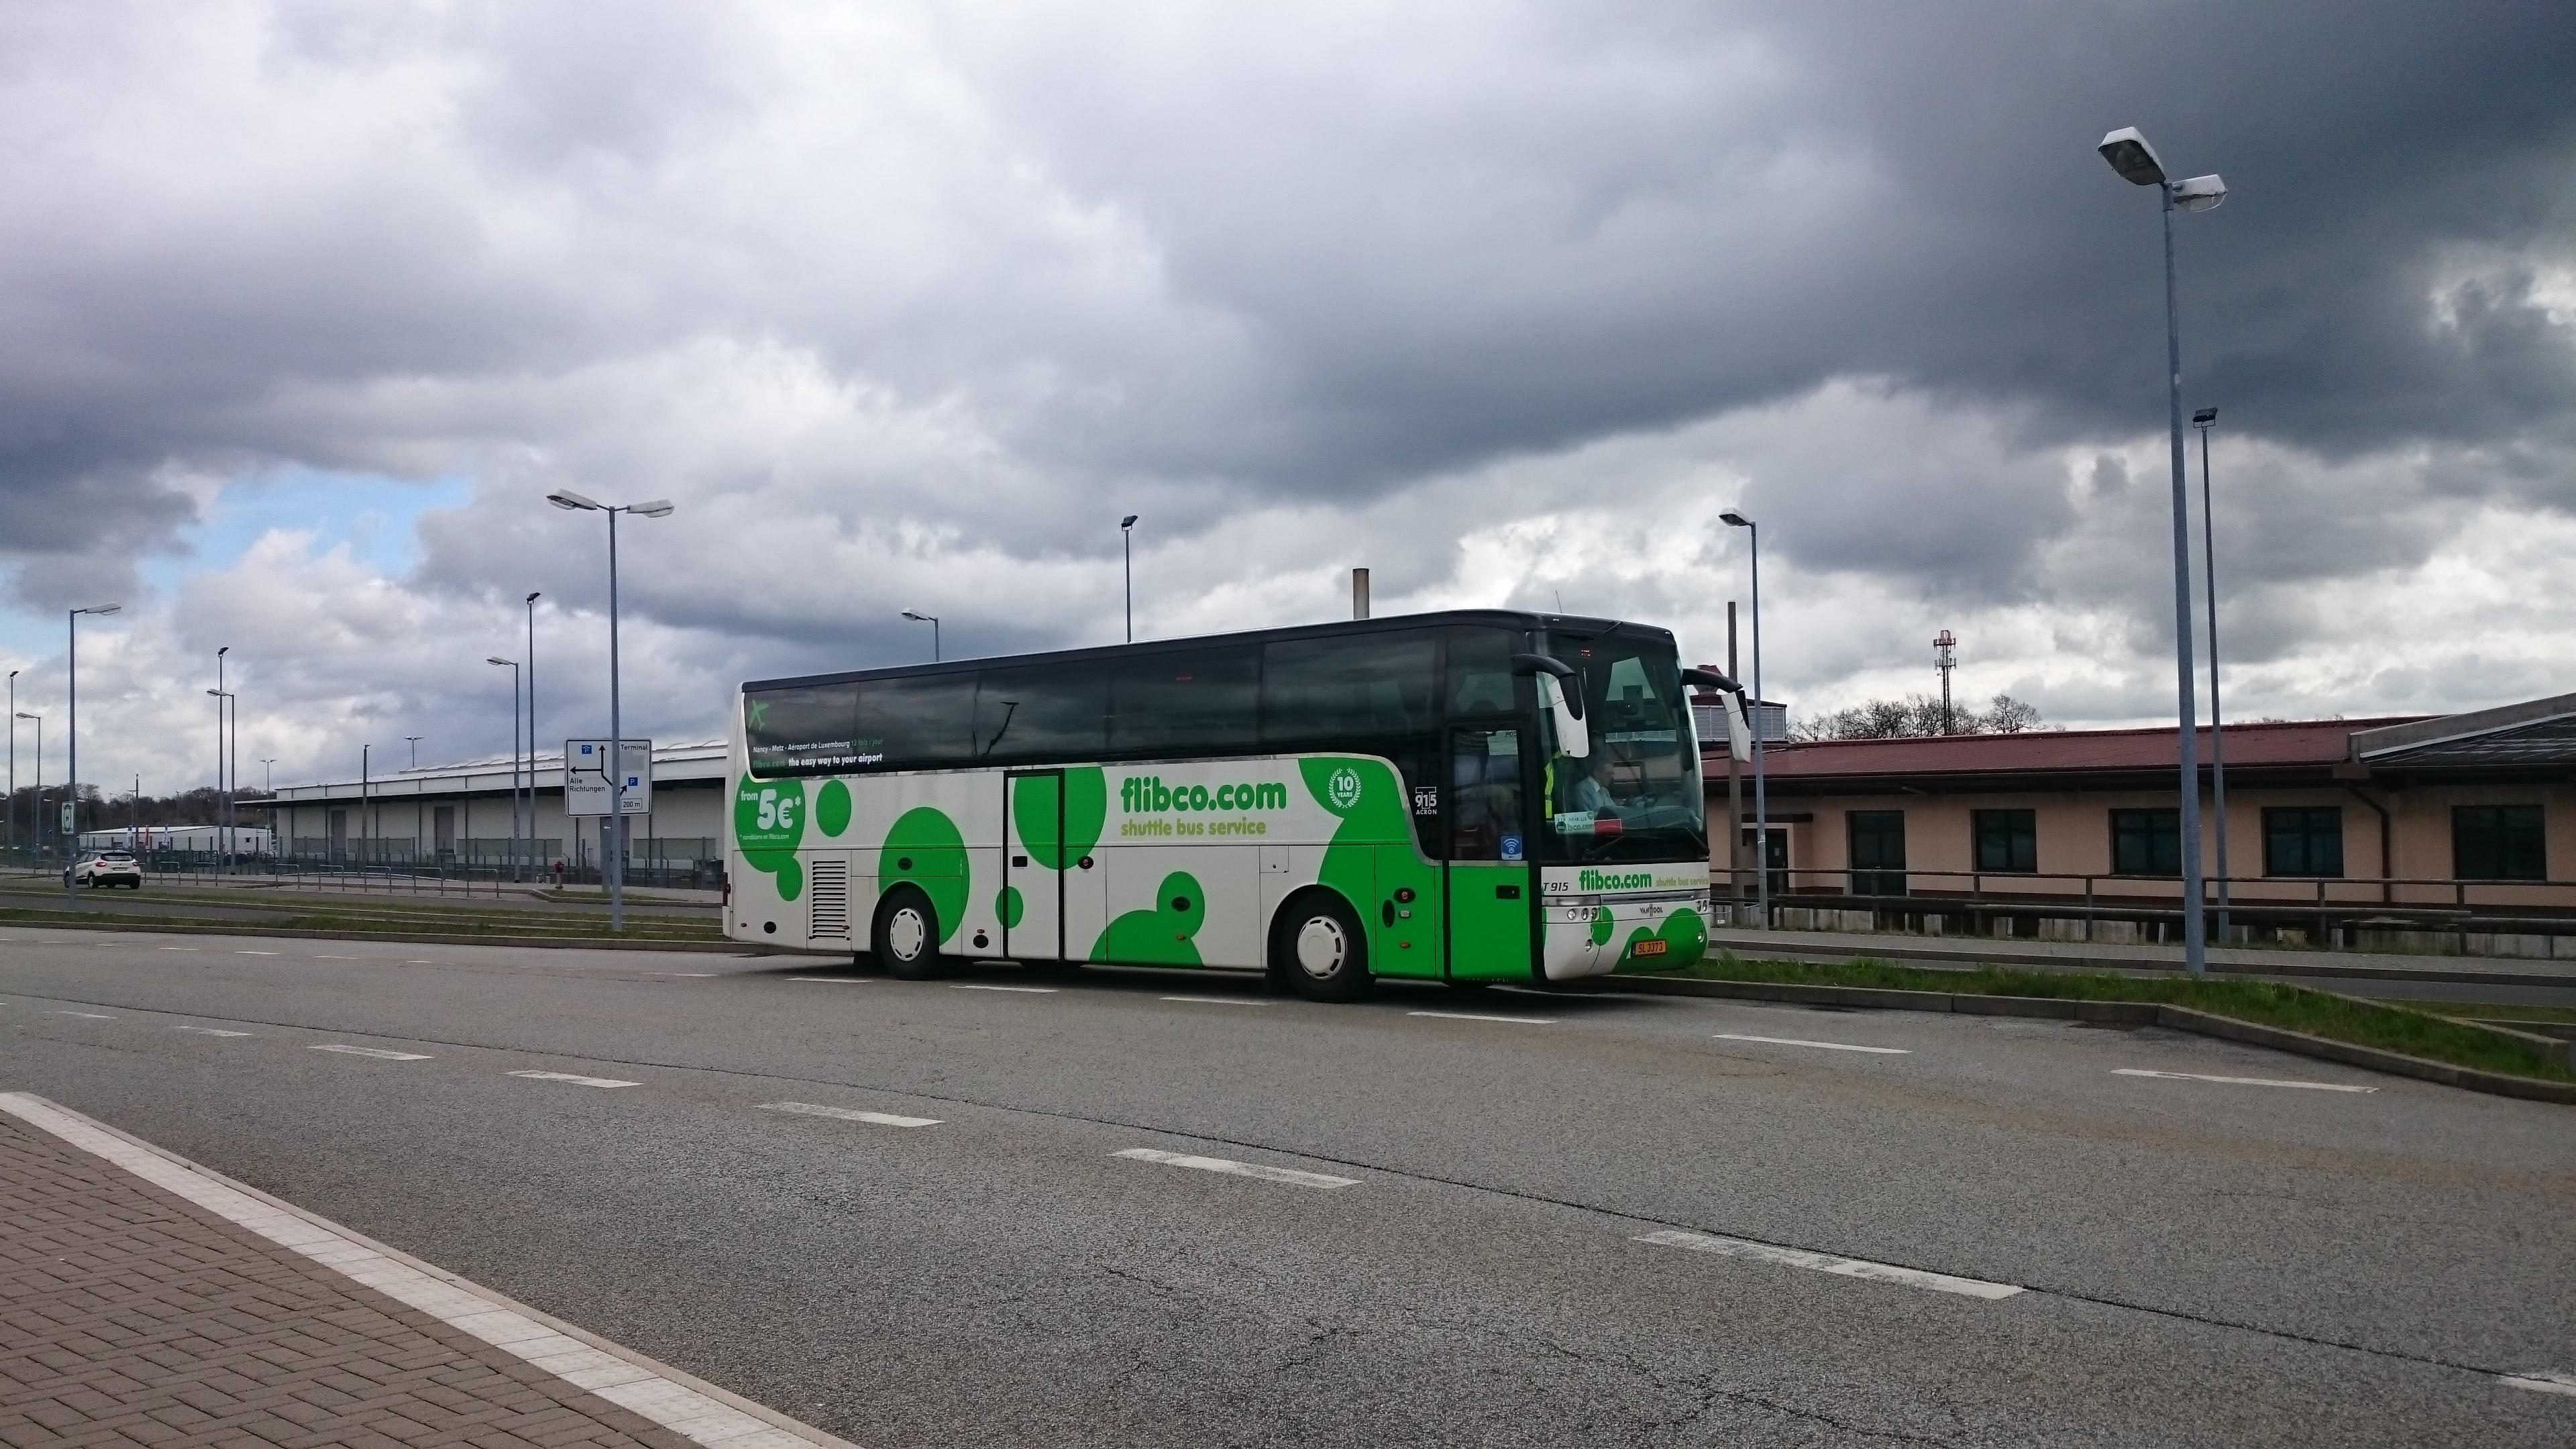 airport frankfurt hahn bus. Black Bedroom Furniture Sets. Home Design Ideas